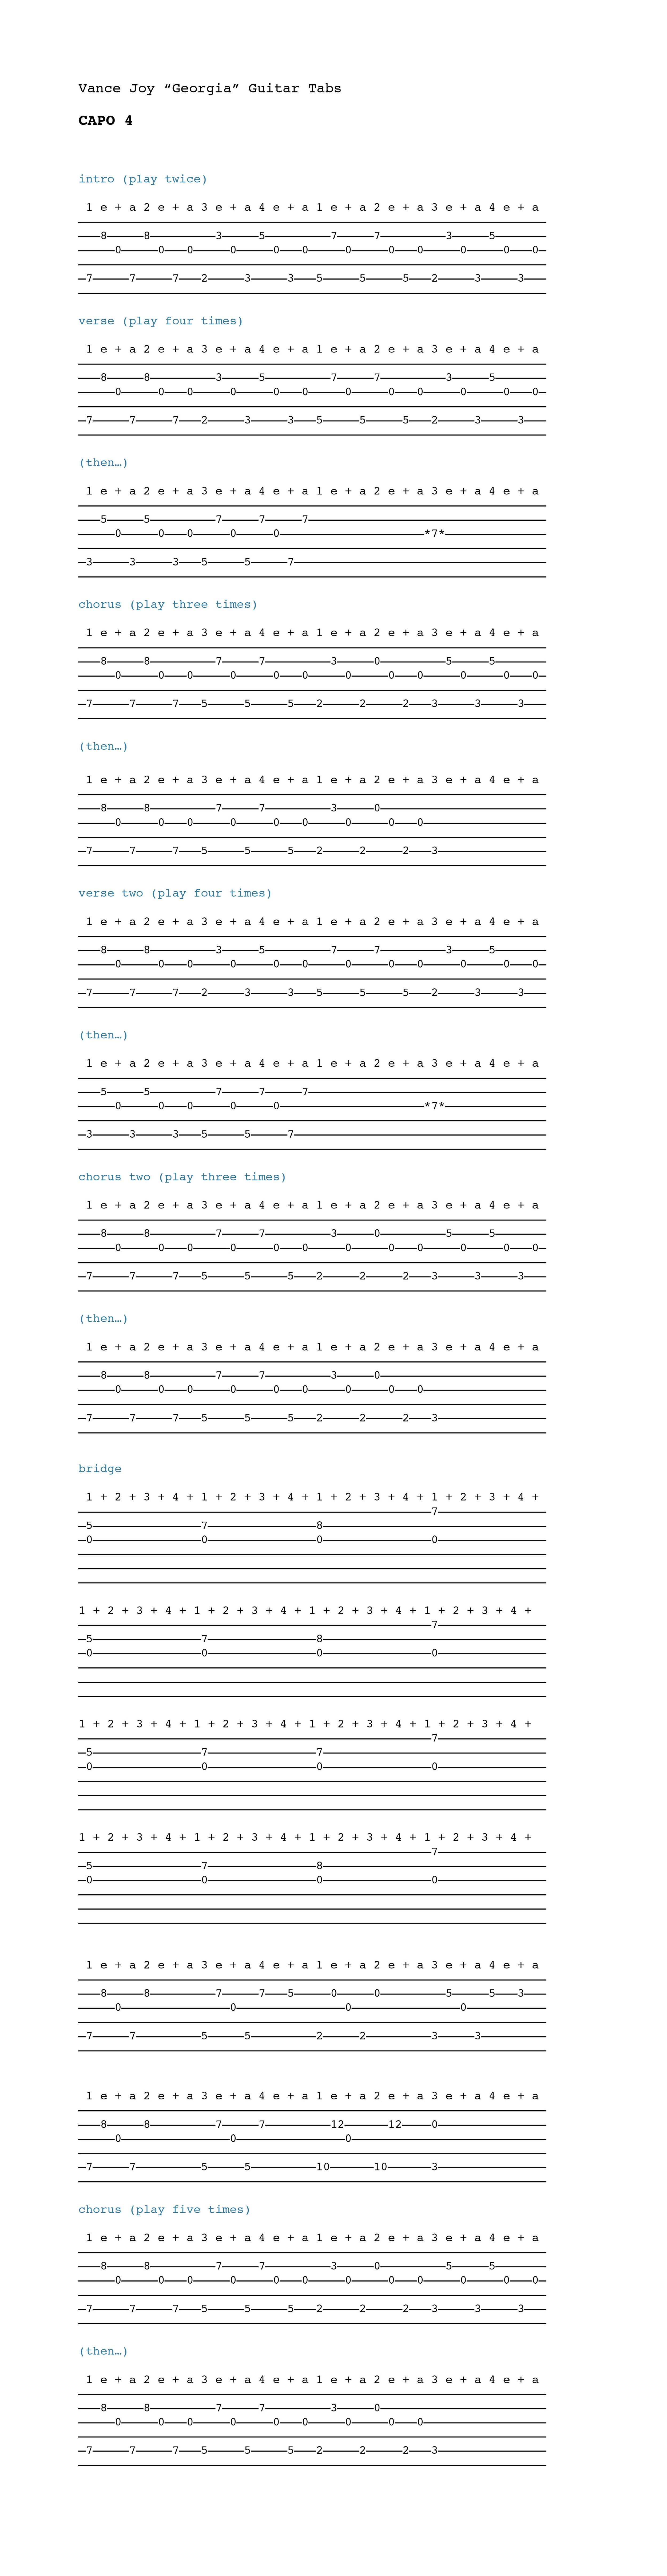 Midnight Train To Georgia Guitar Chords Choice Image Basic Guitar